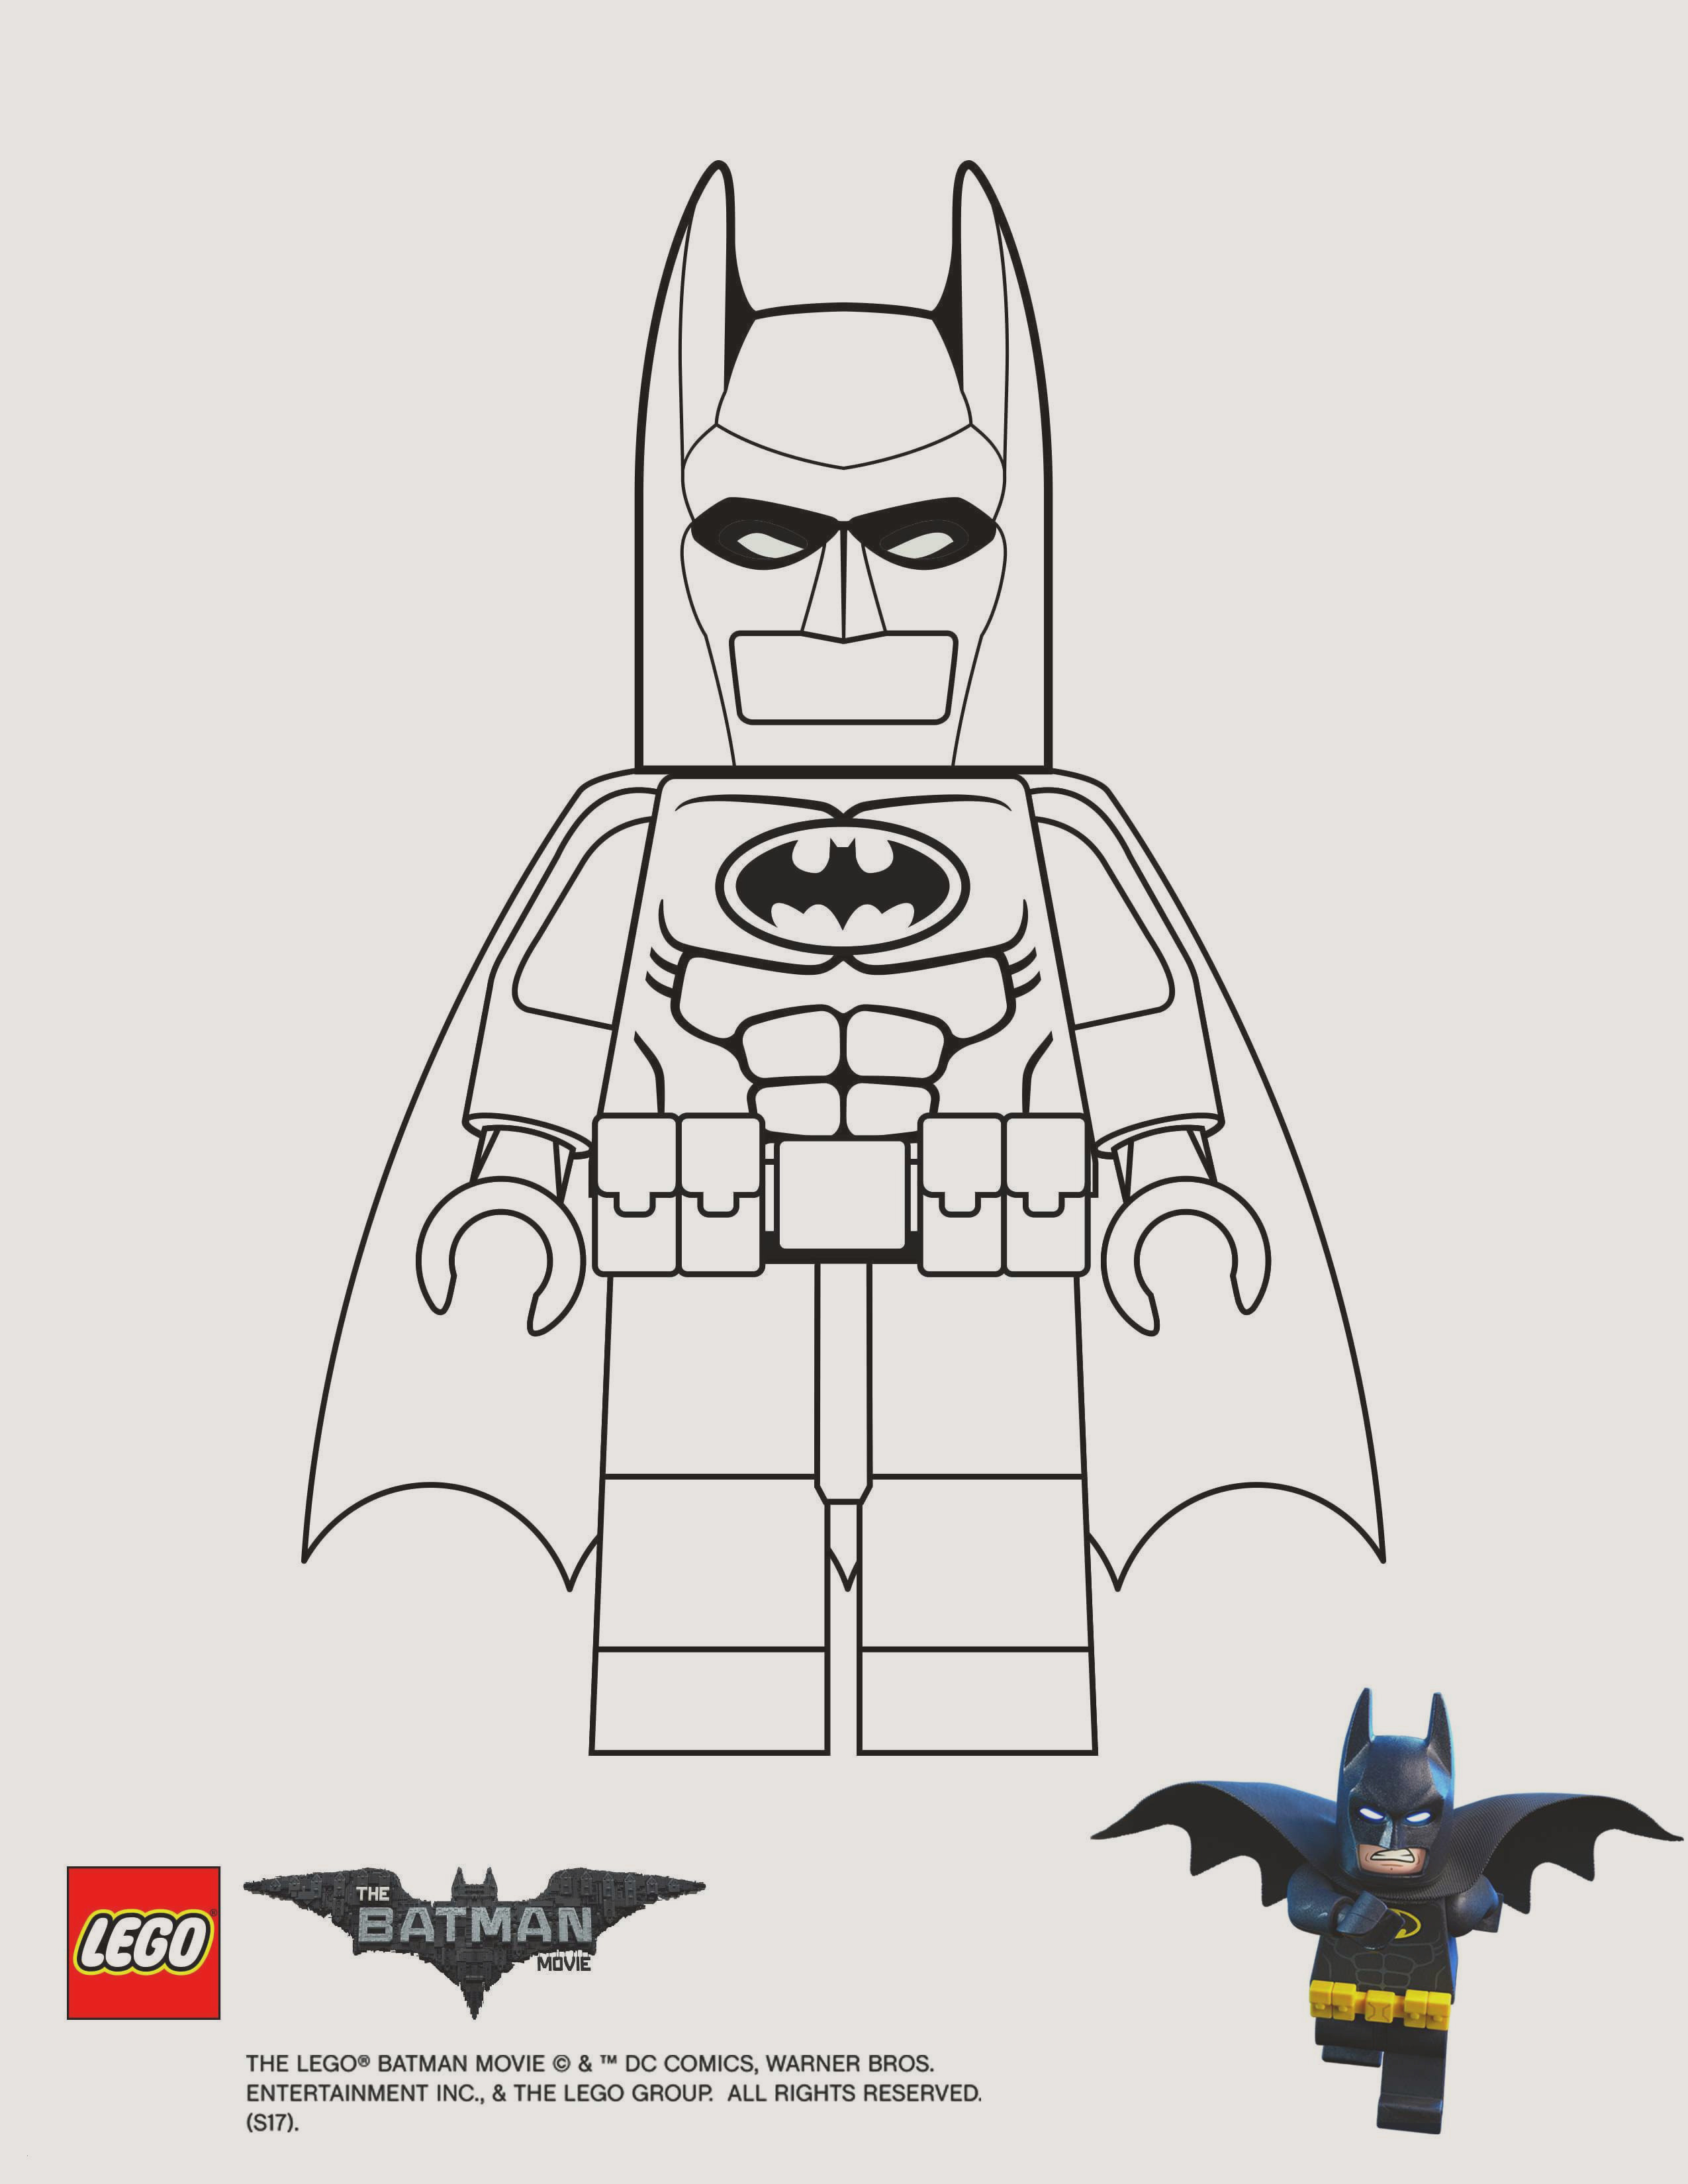 Ausmalbilder Batman Neu 30 Super Harley Quinn Ausmalbilder Ausdrucken Stock